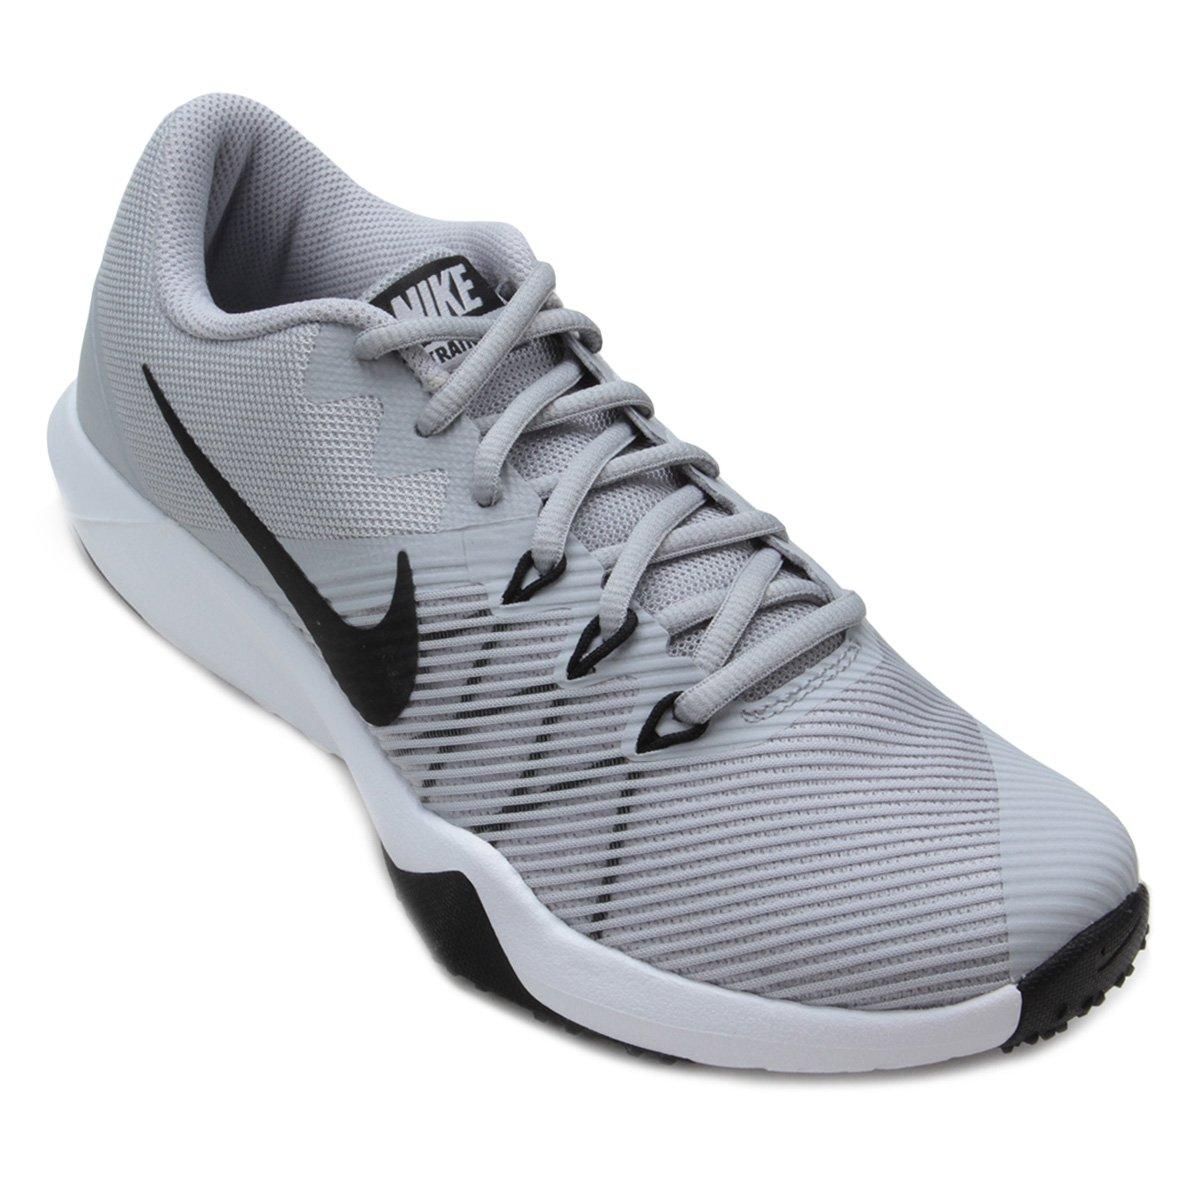 e Nike Branco Preto Retaliation Tênis Tênis Masculino Nike TR Z0xCTqwH0